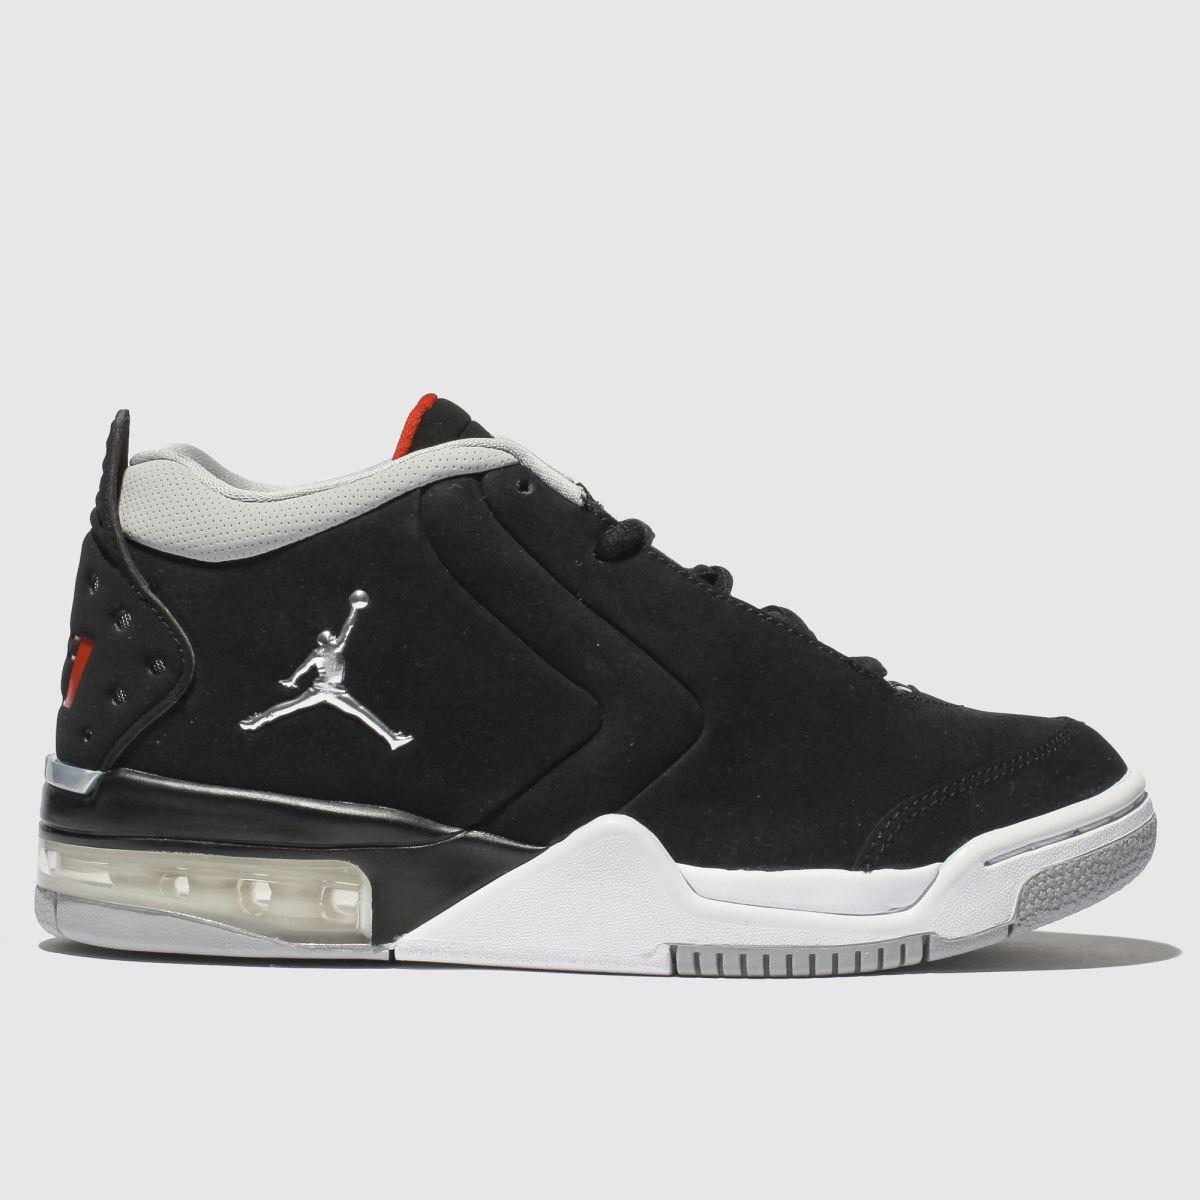 Nike Jordan Black & Silver Nike Jordan Big Fund Trainers Youth